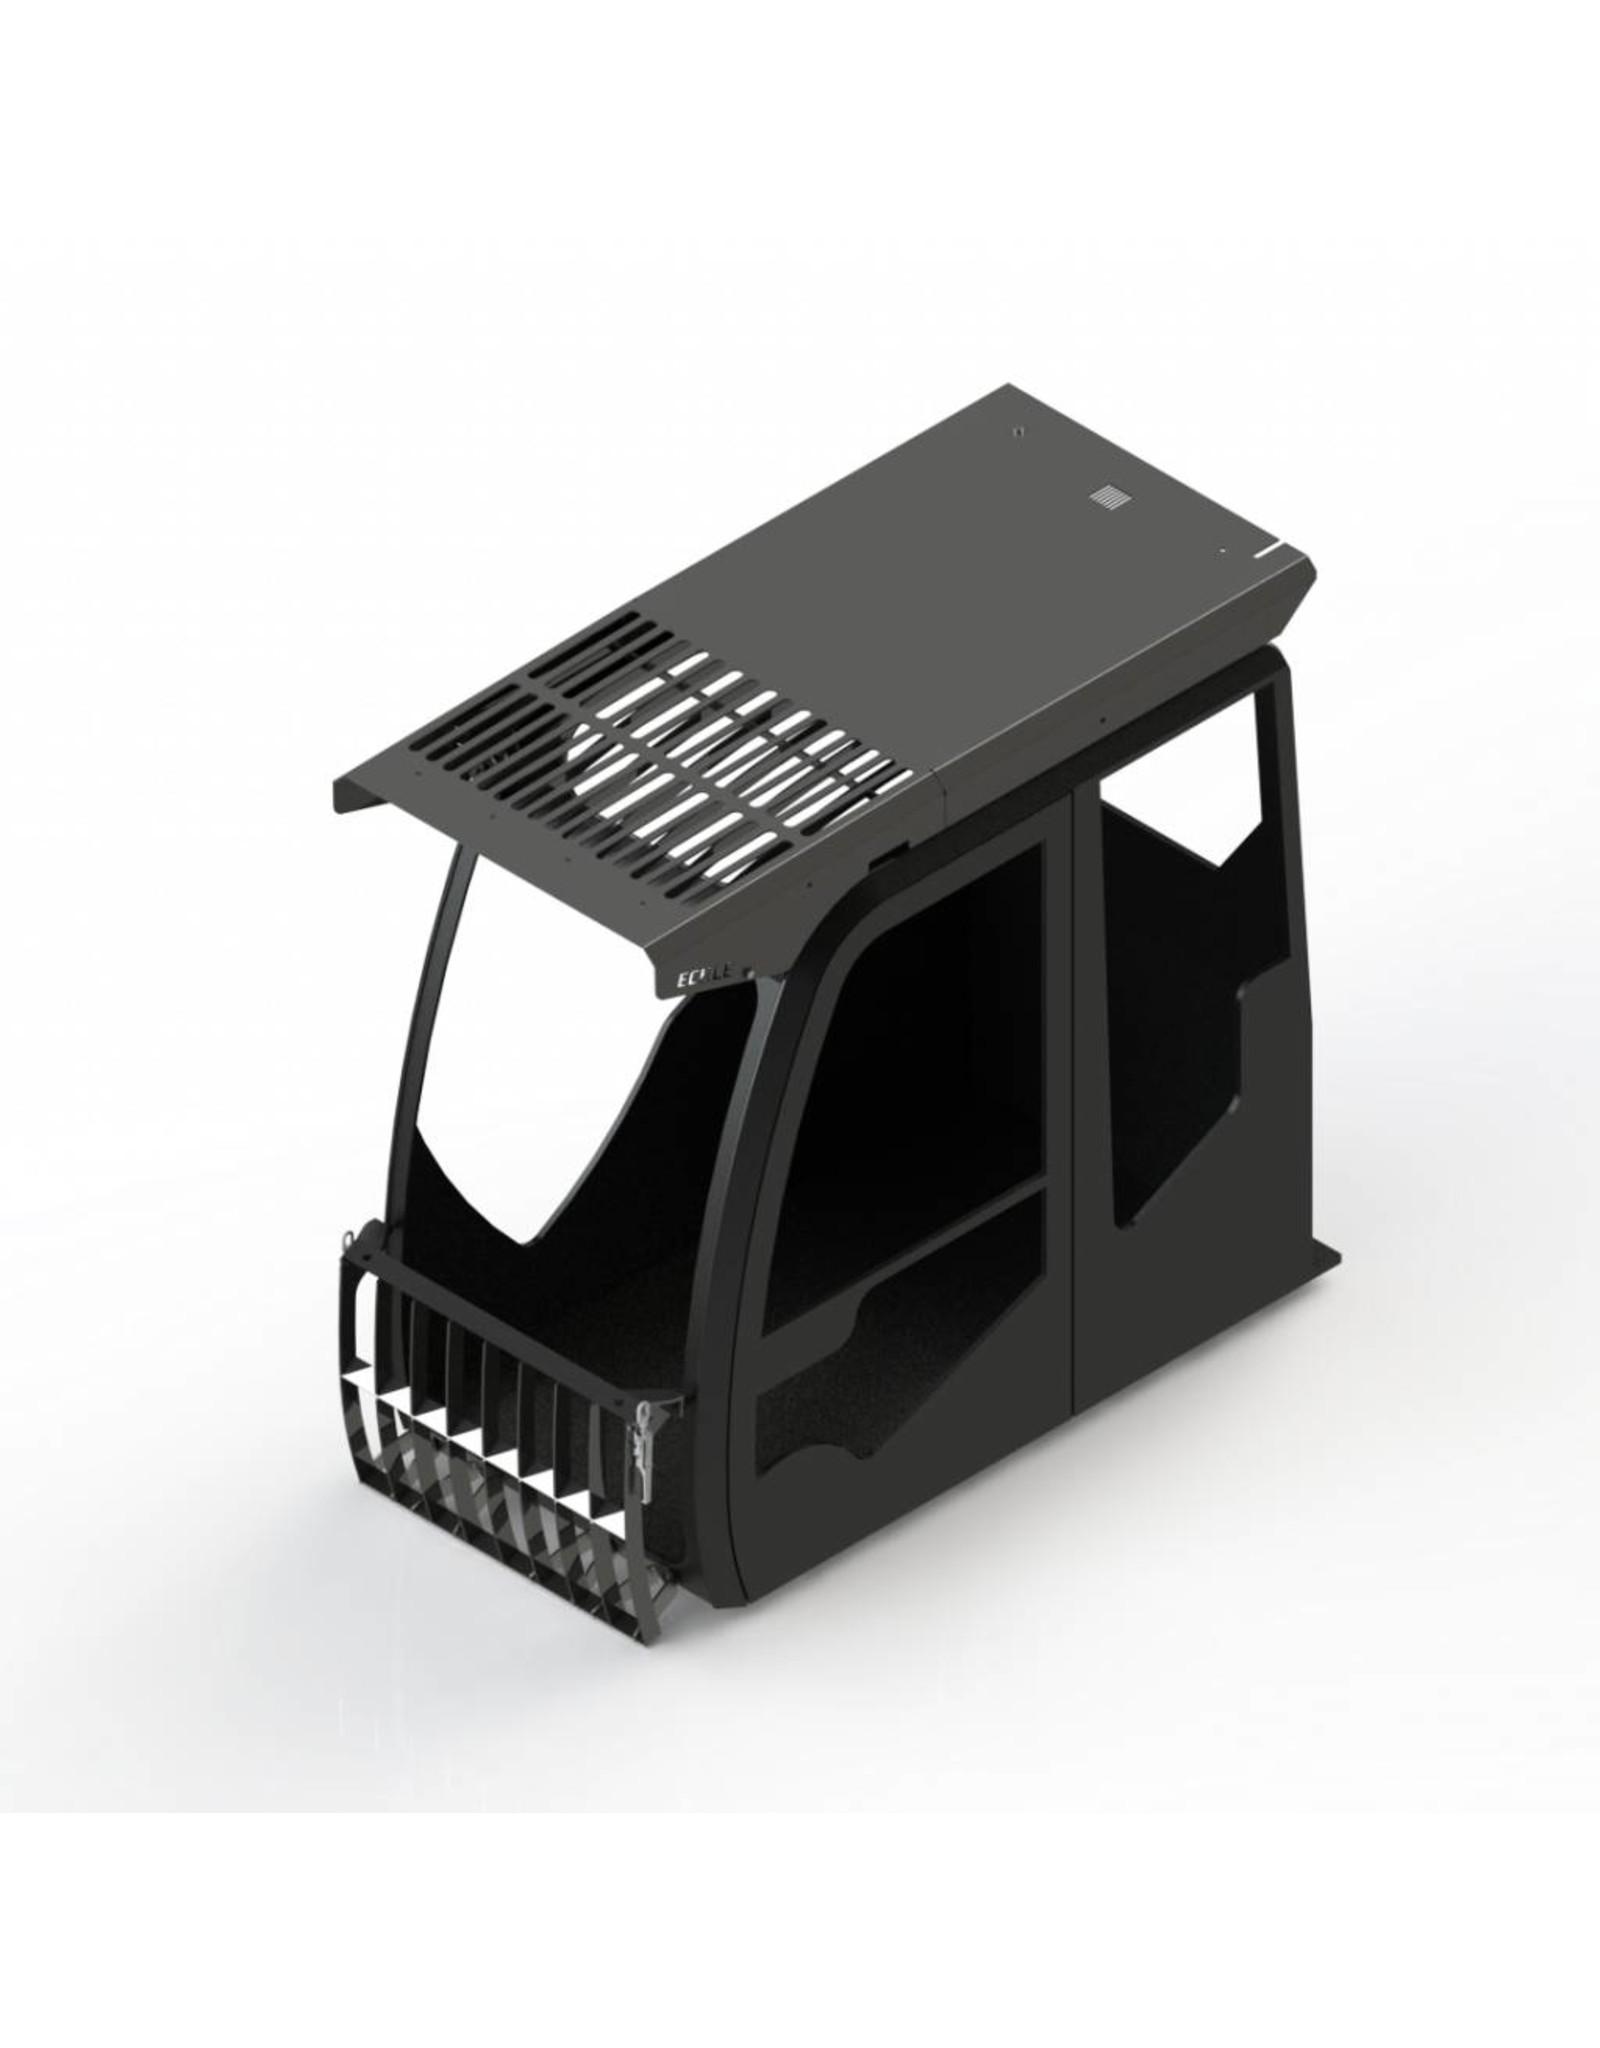 Echle Hartstahl GmbH FOPS for Doosan DX165W-5